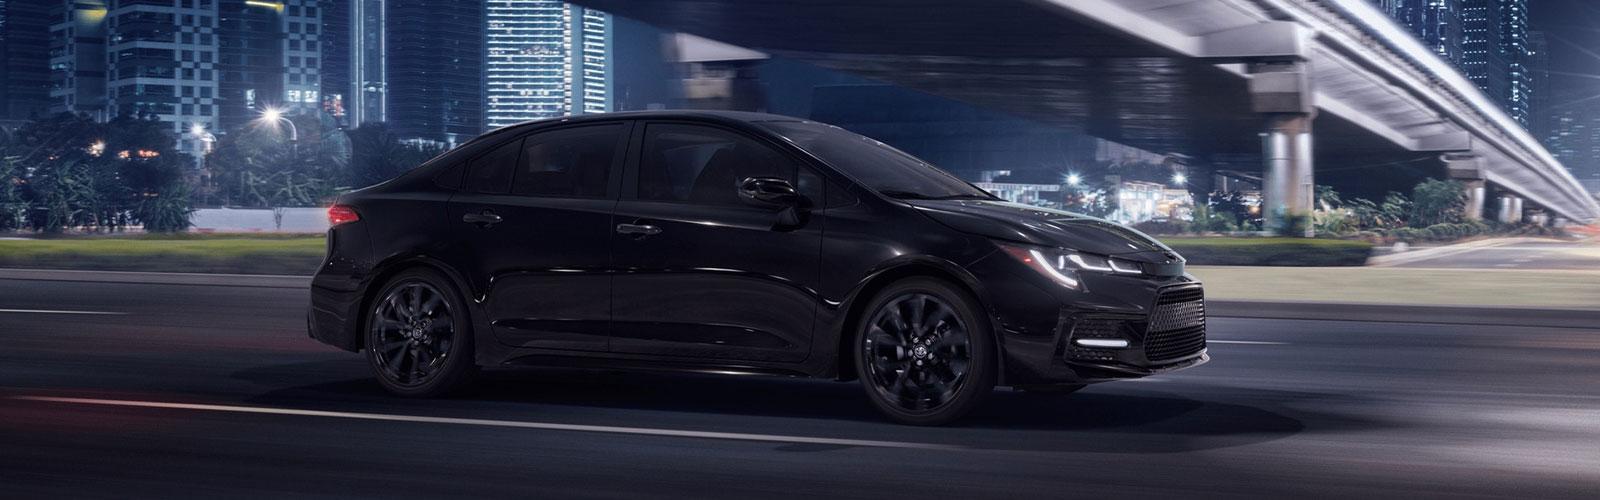 2020 Toyota Corolla Hybrid Models For Sale In Grenada, Mississippi